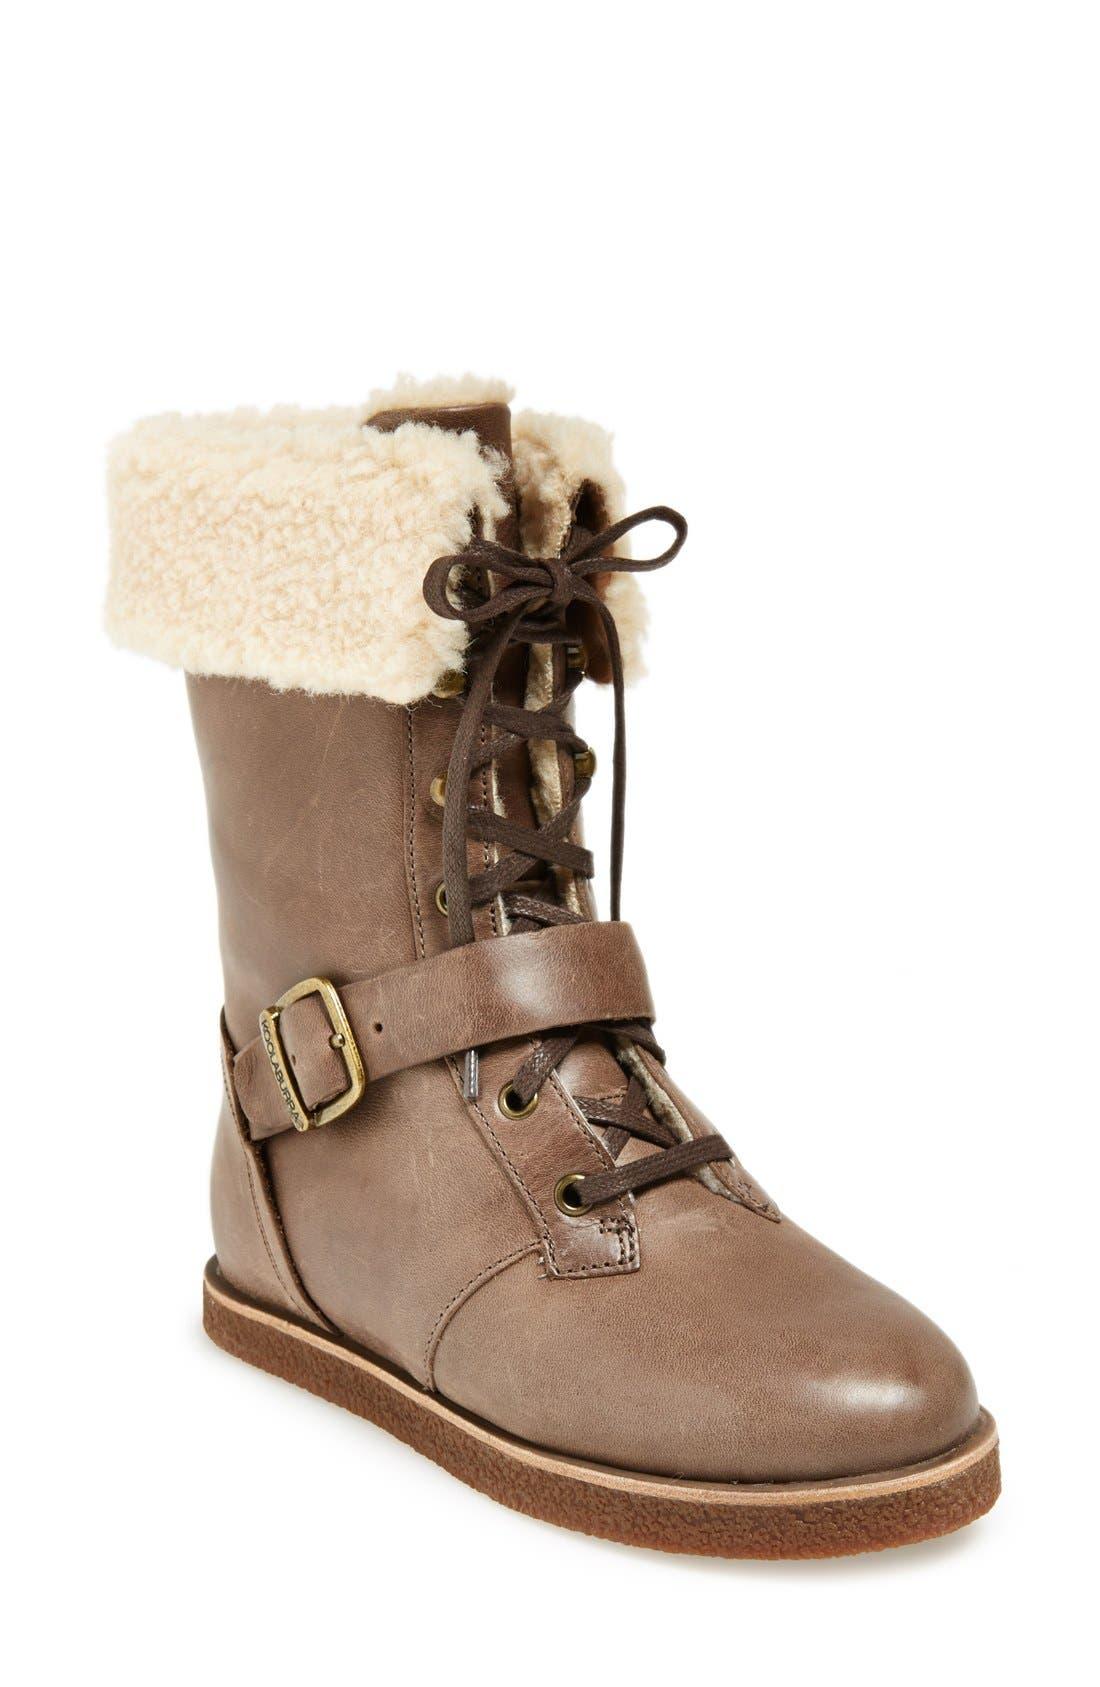 Main Image - Koolaburra 'Jovi' Lace-Up Moto Boot (Women)